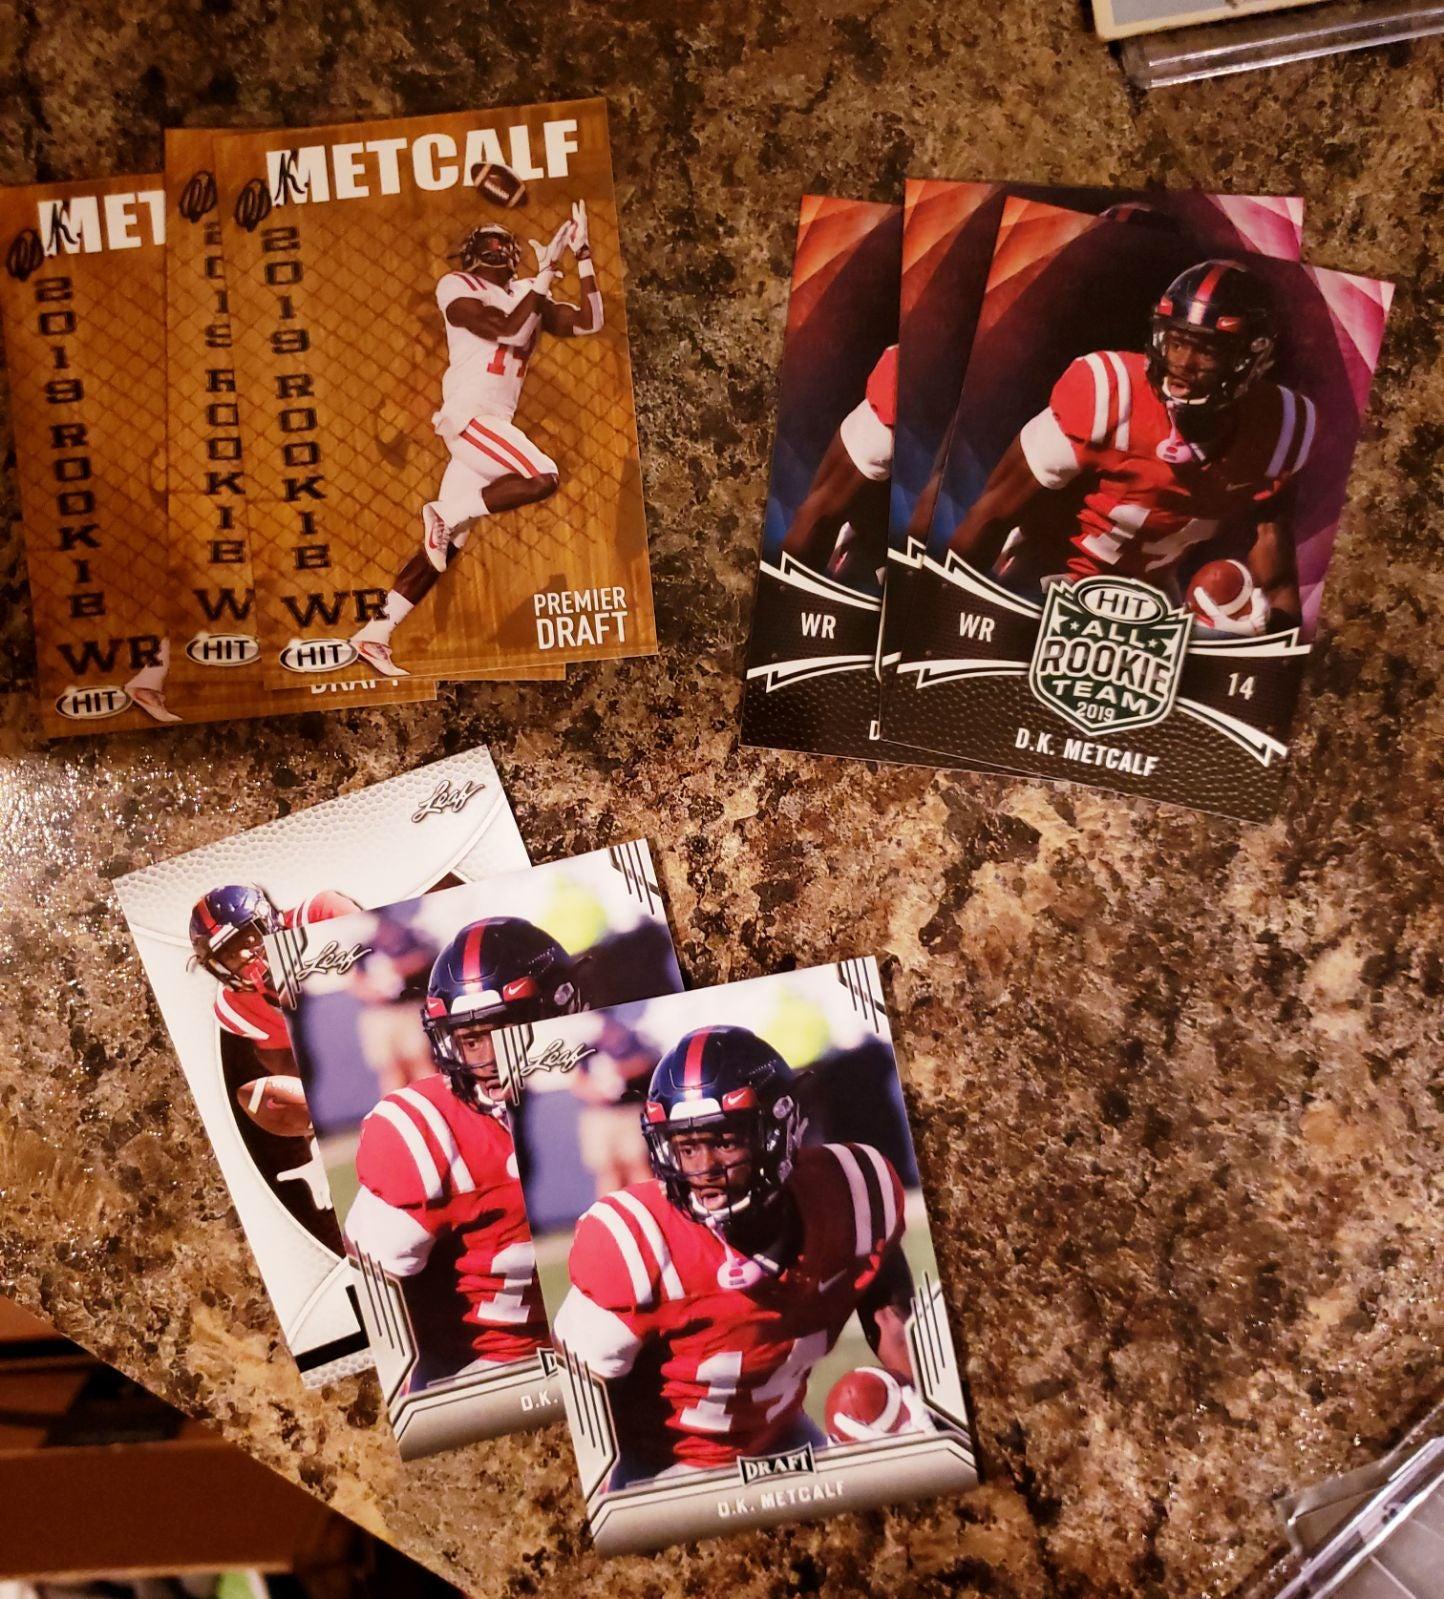 DK Metcalf Rookie 9 Card Lot Seahawks RC